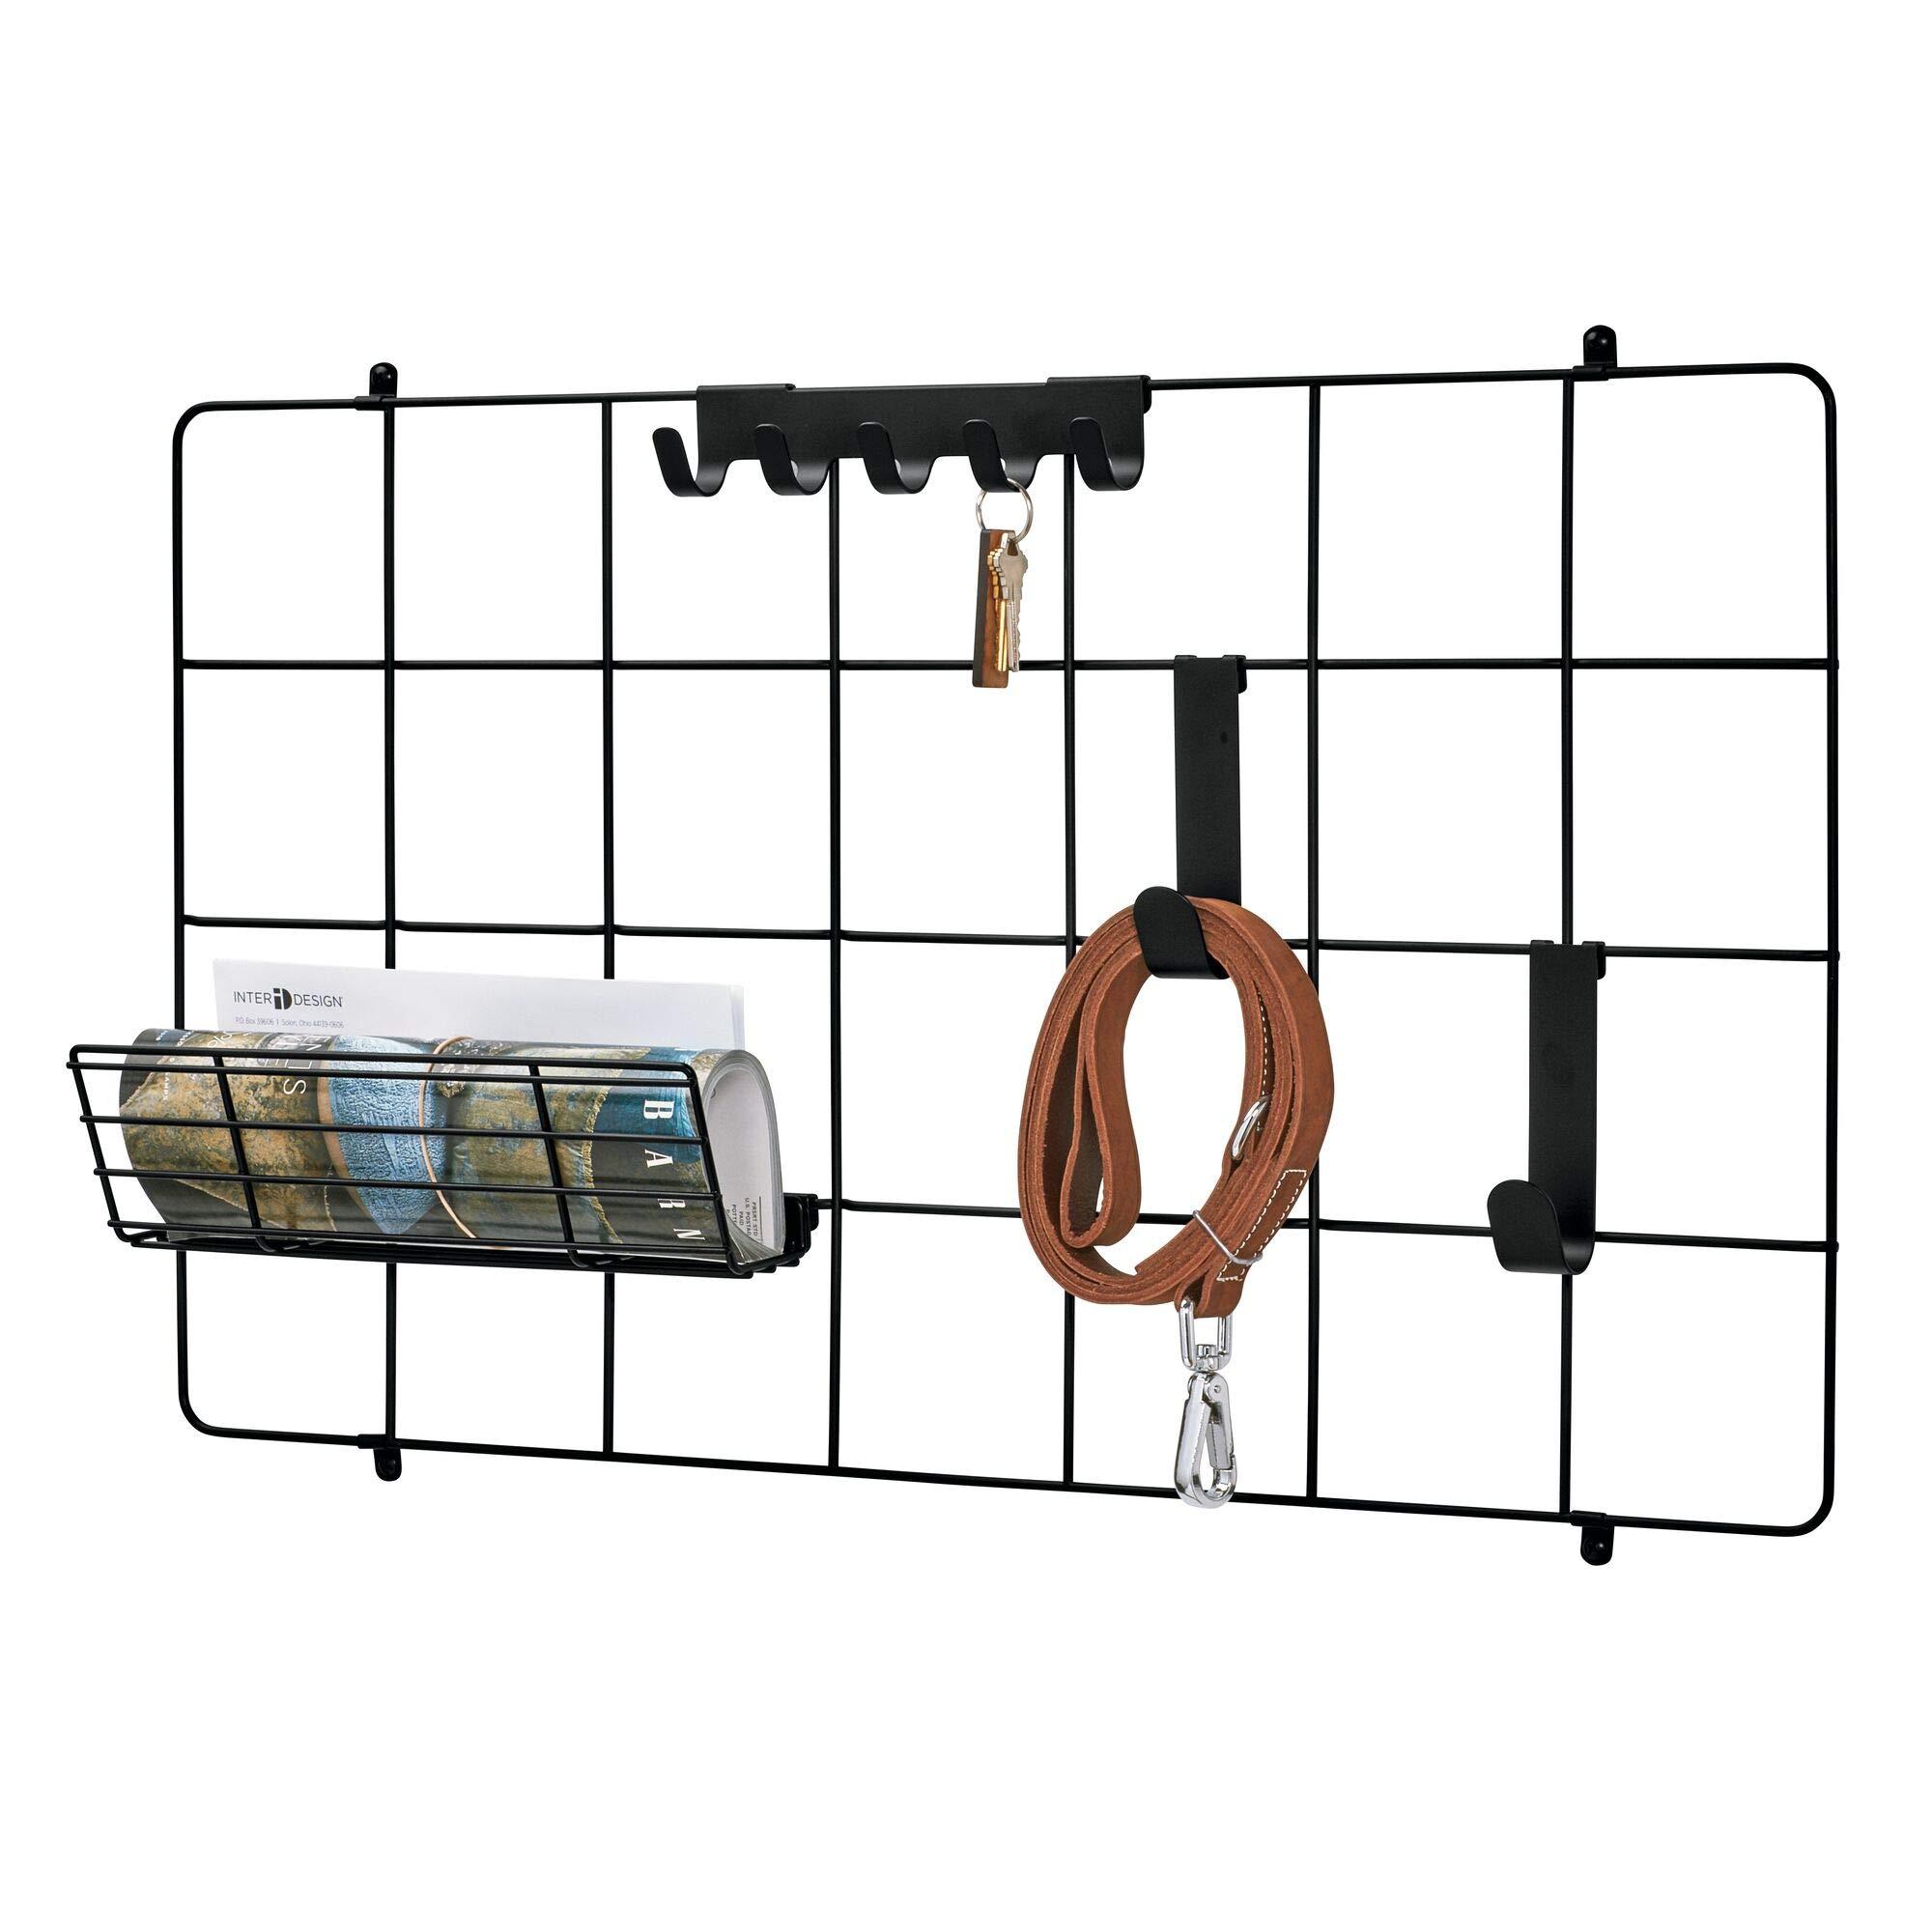 iDesign Jayce Metal Wall Grid System, Modular Grid Organizational Panel for Additional Storage in Kitchen, Bathroom, Office, Craft Room, Garage, Basement 16.6'' x 28.16'' x 5.57'' - Matte Black by iDesign